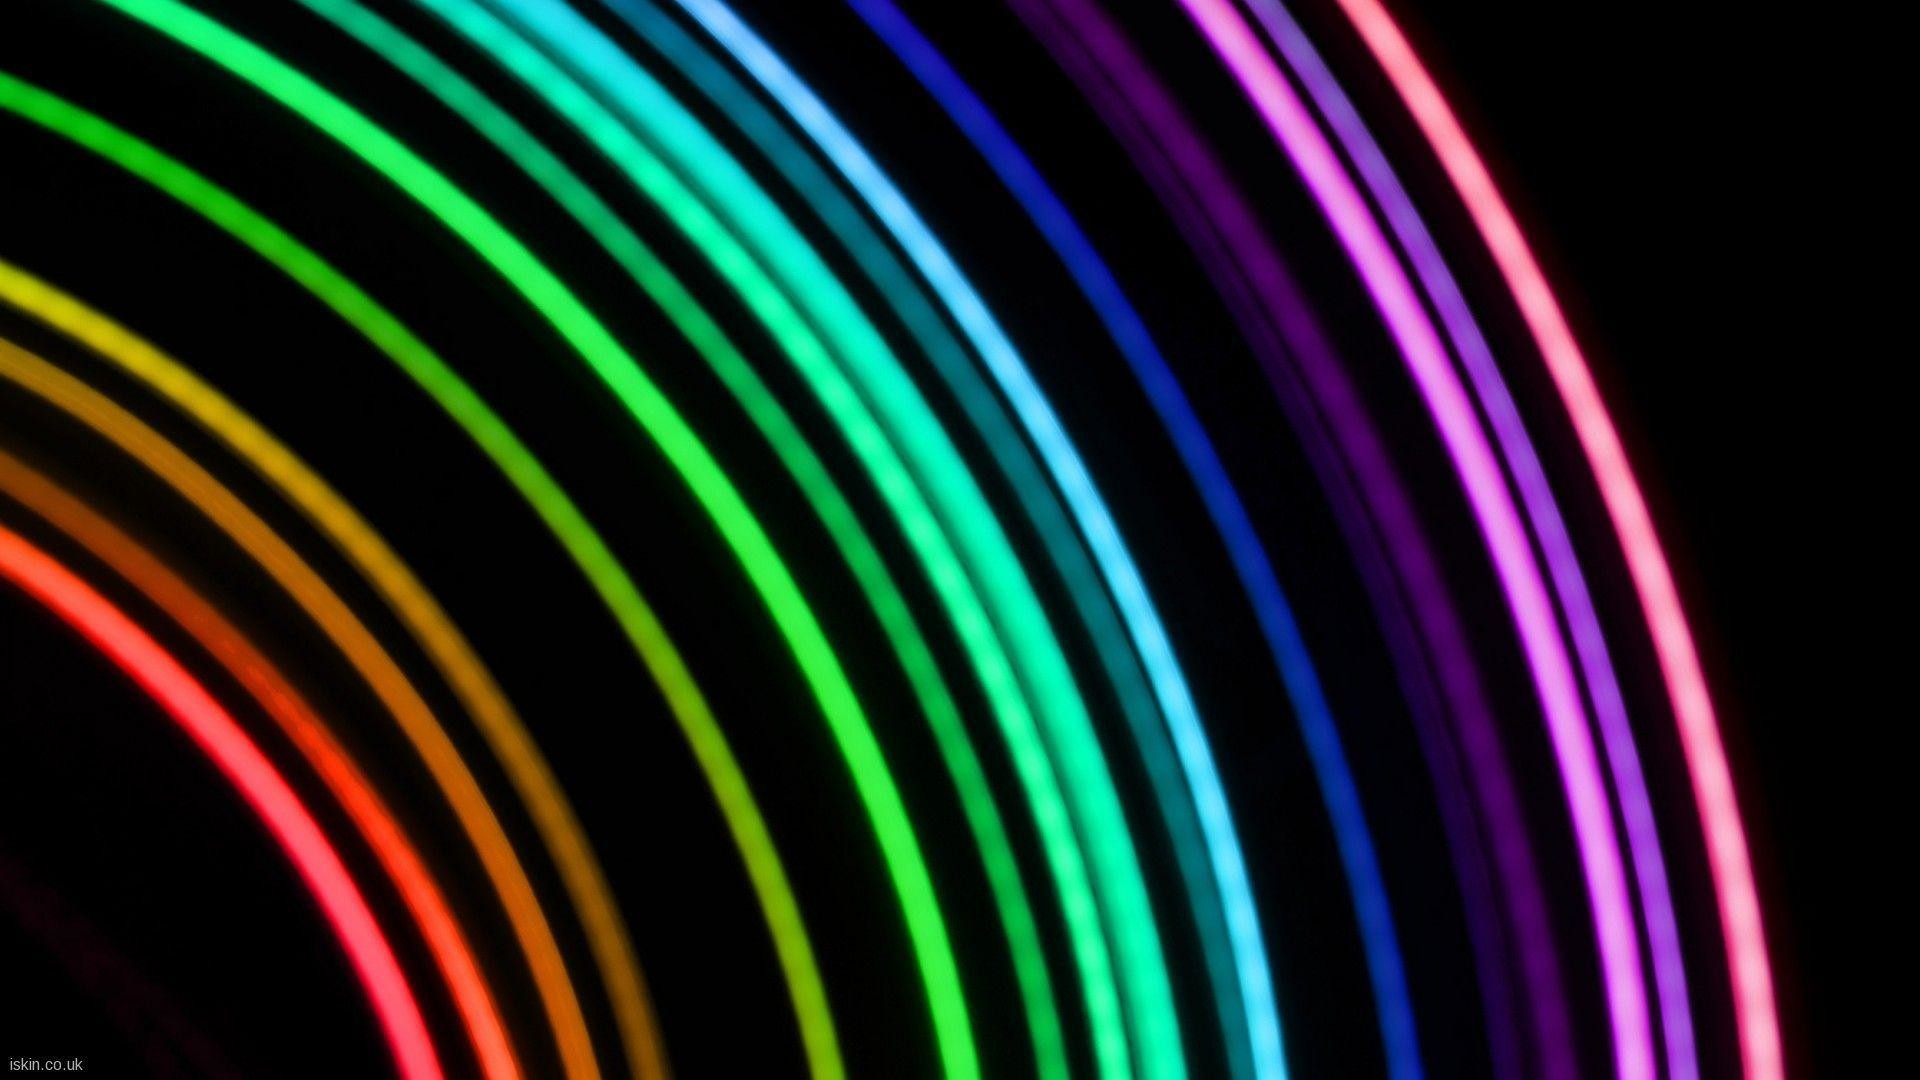 Res: 1920x1080, Neon Wallpaper | Large HD Wallpaper Database